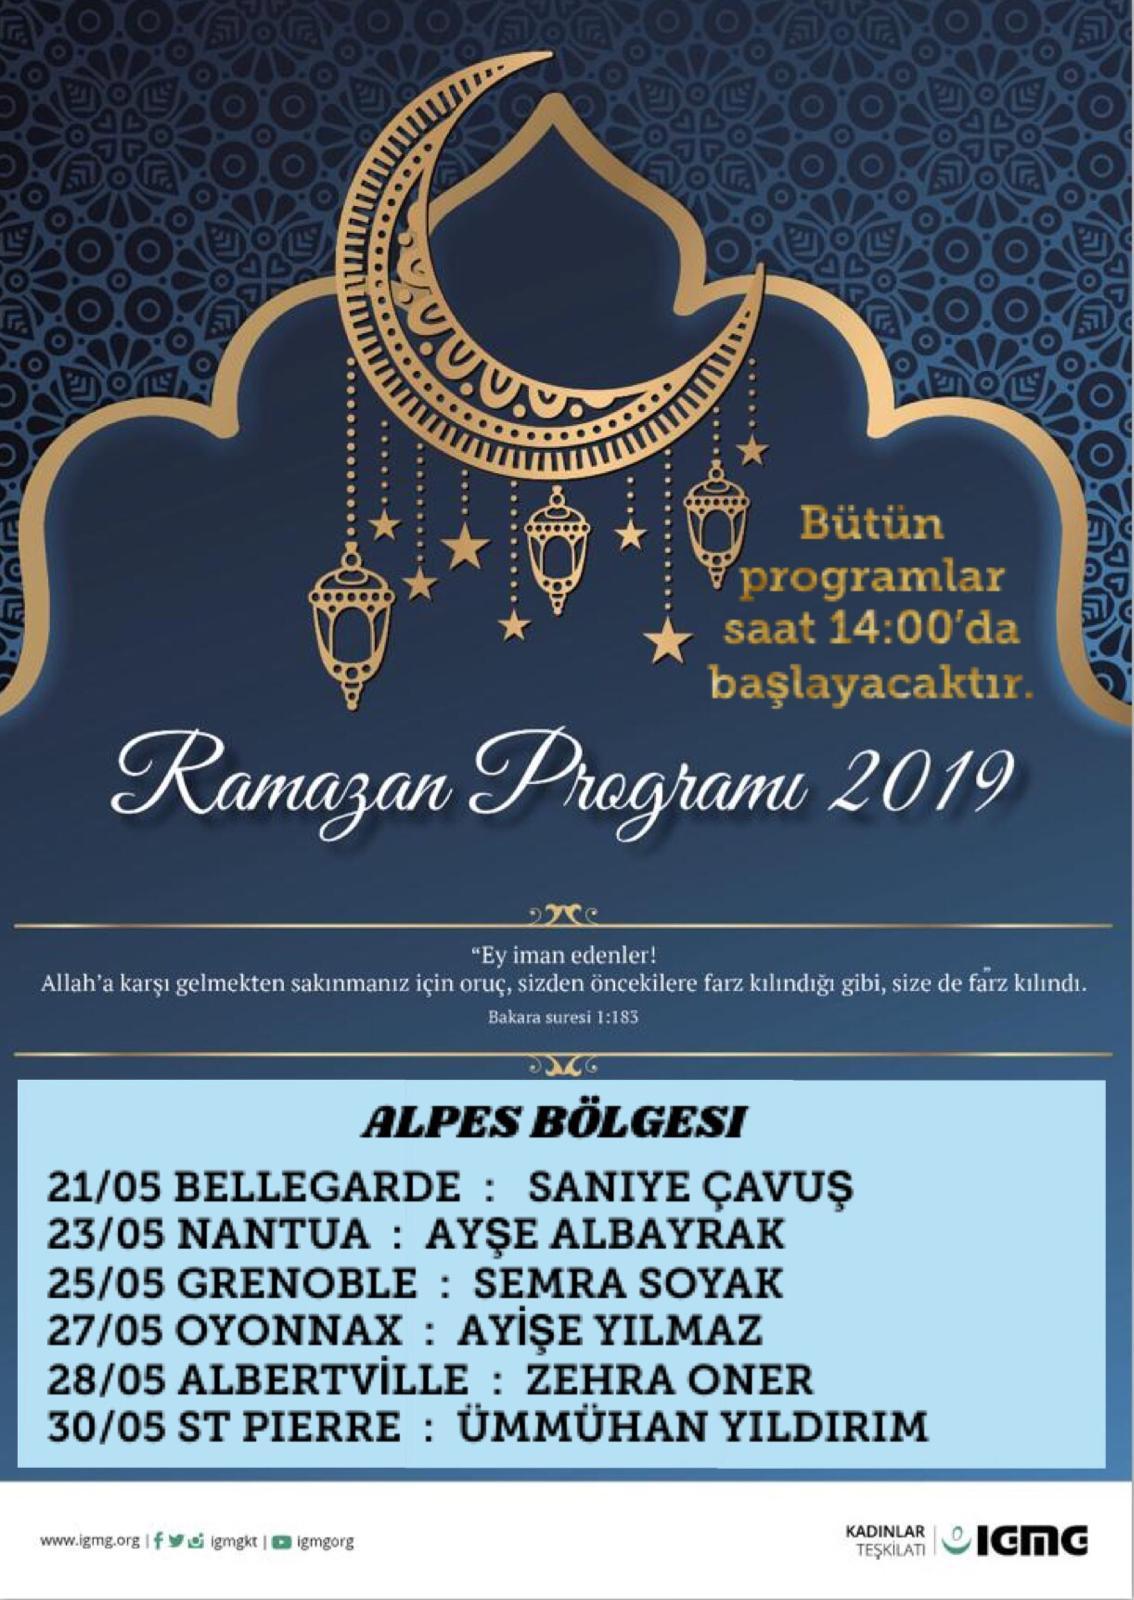 KT Ramazan 1